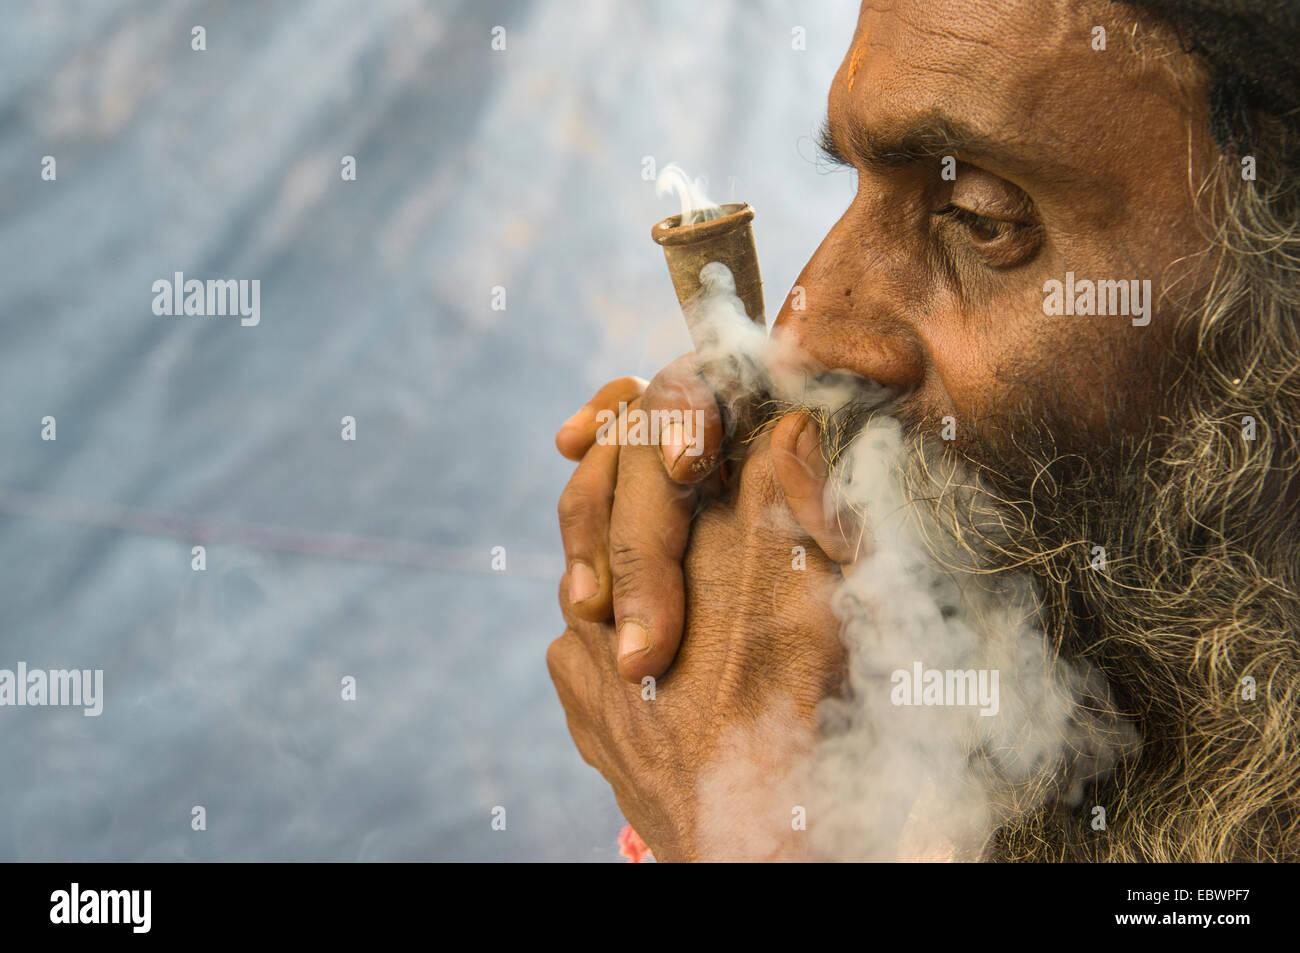 Udaisin Sadhu, holy man, smoking marihuana at the Sangam, the confluence of the rivers Ganges, Yamuna and Saraswati - Stock Image